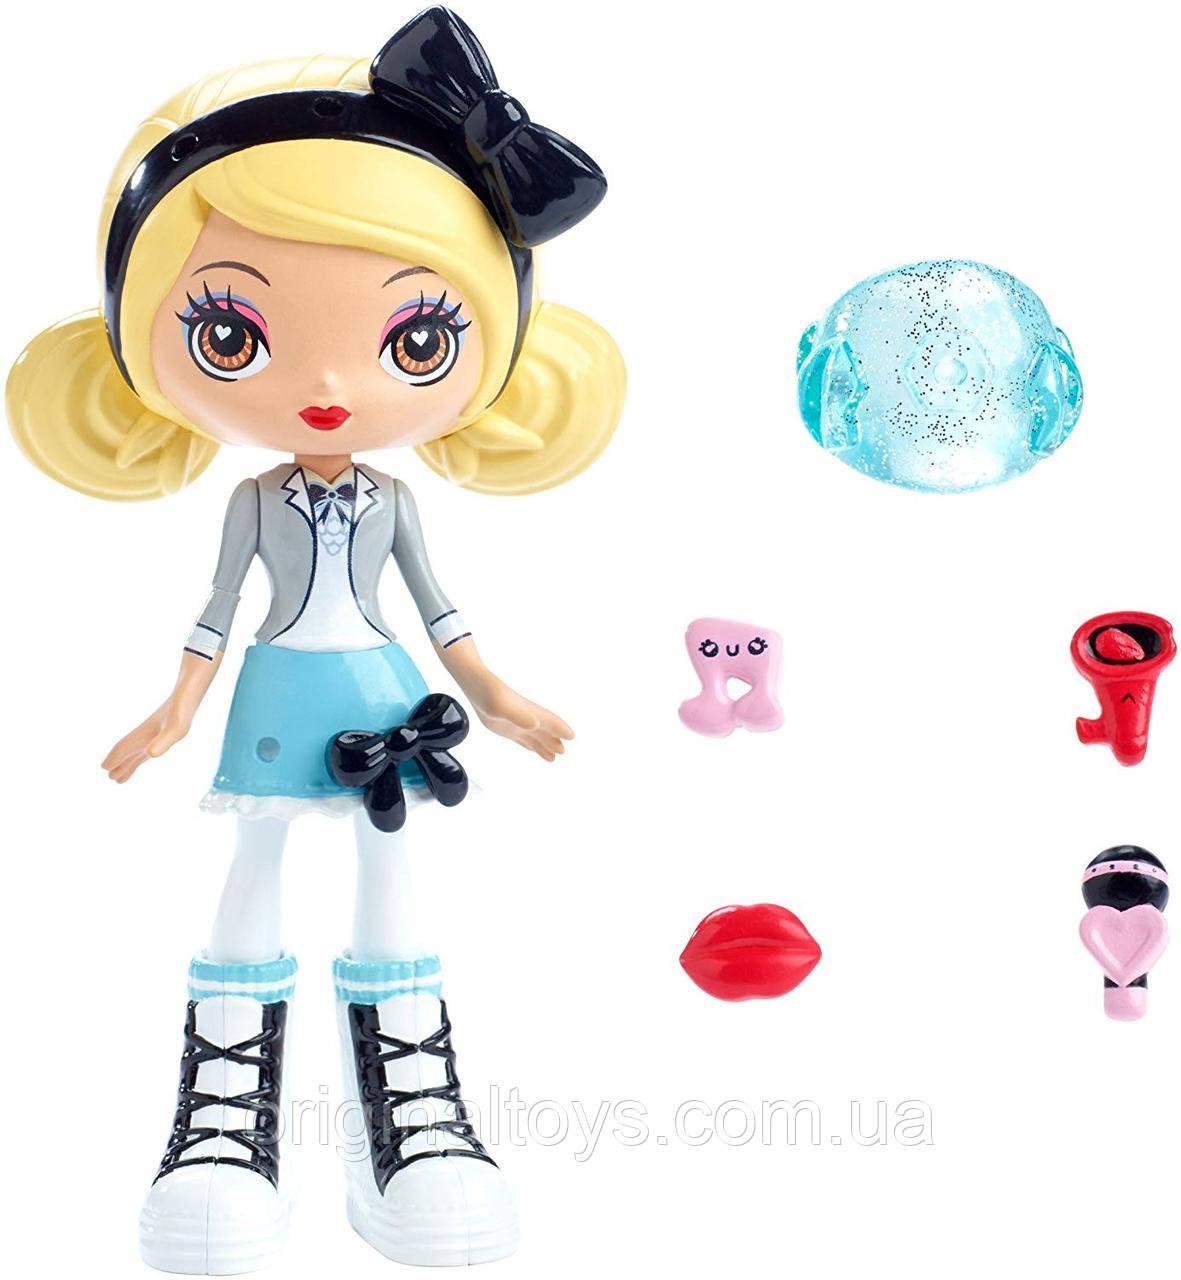 Кукла Модная Джи с аксессуарами Куу Куу Харадзюку Kuu Kuu Harajuku Mattel